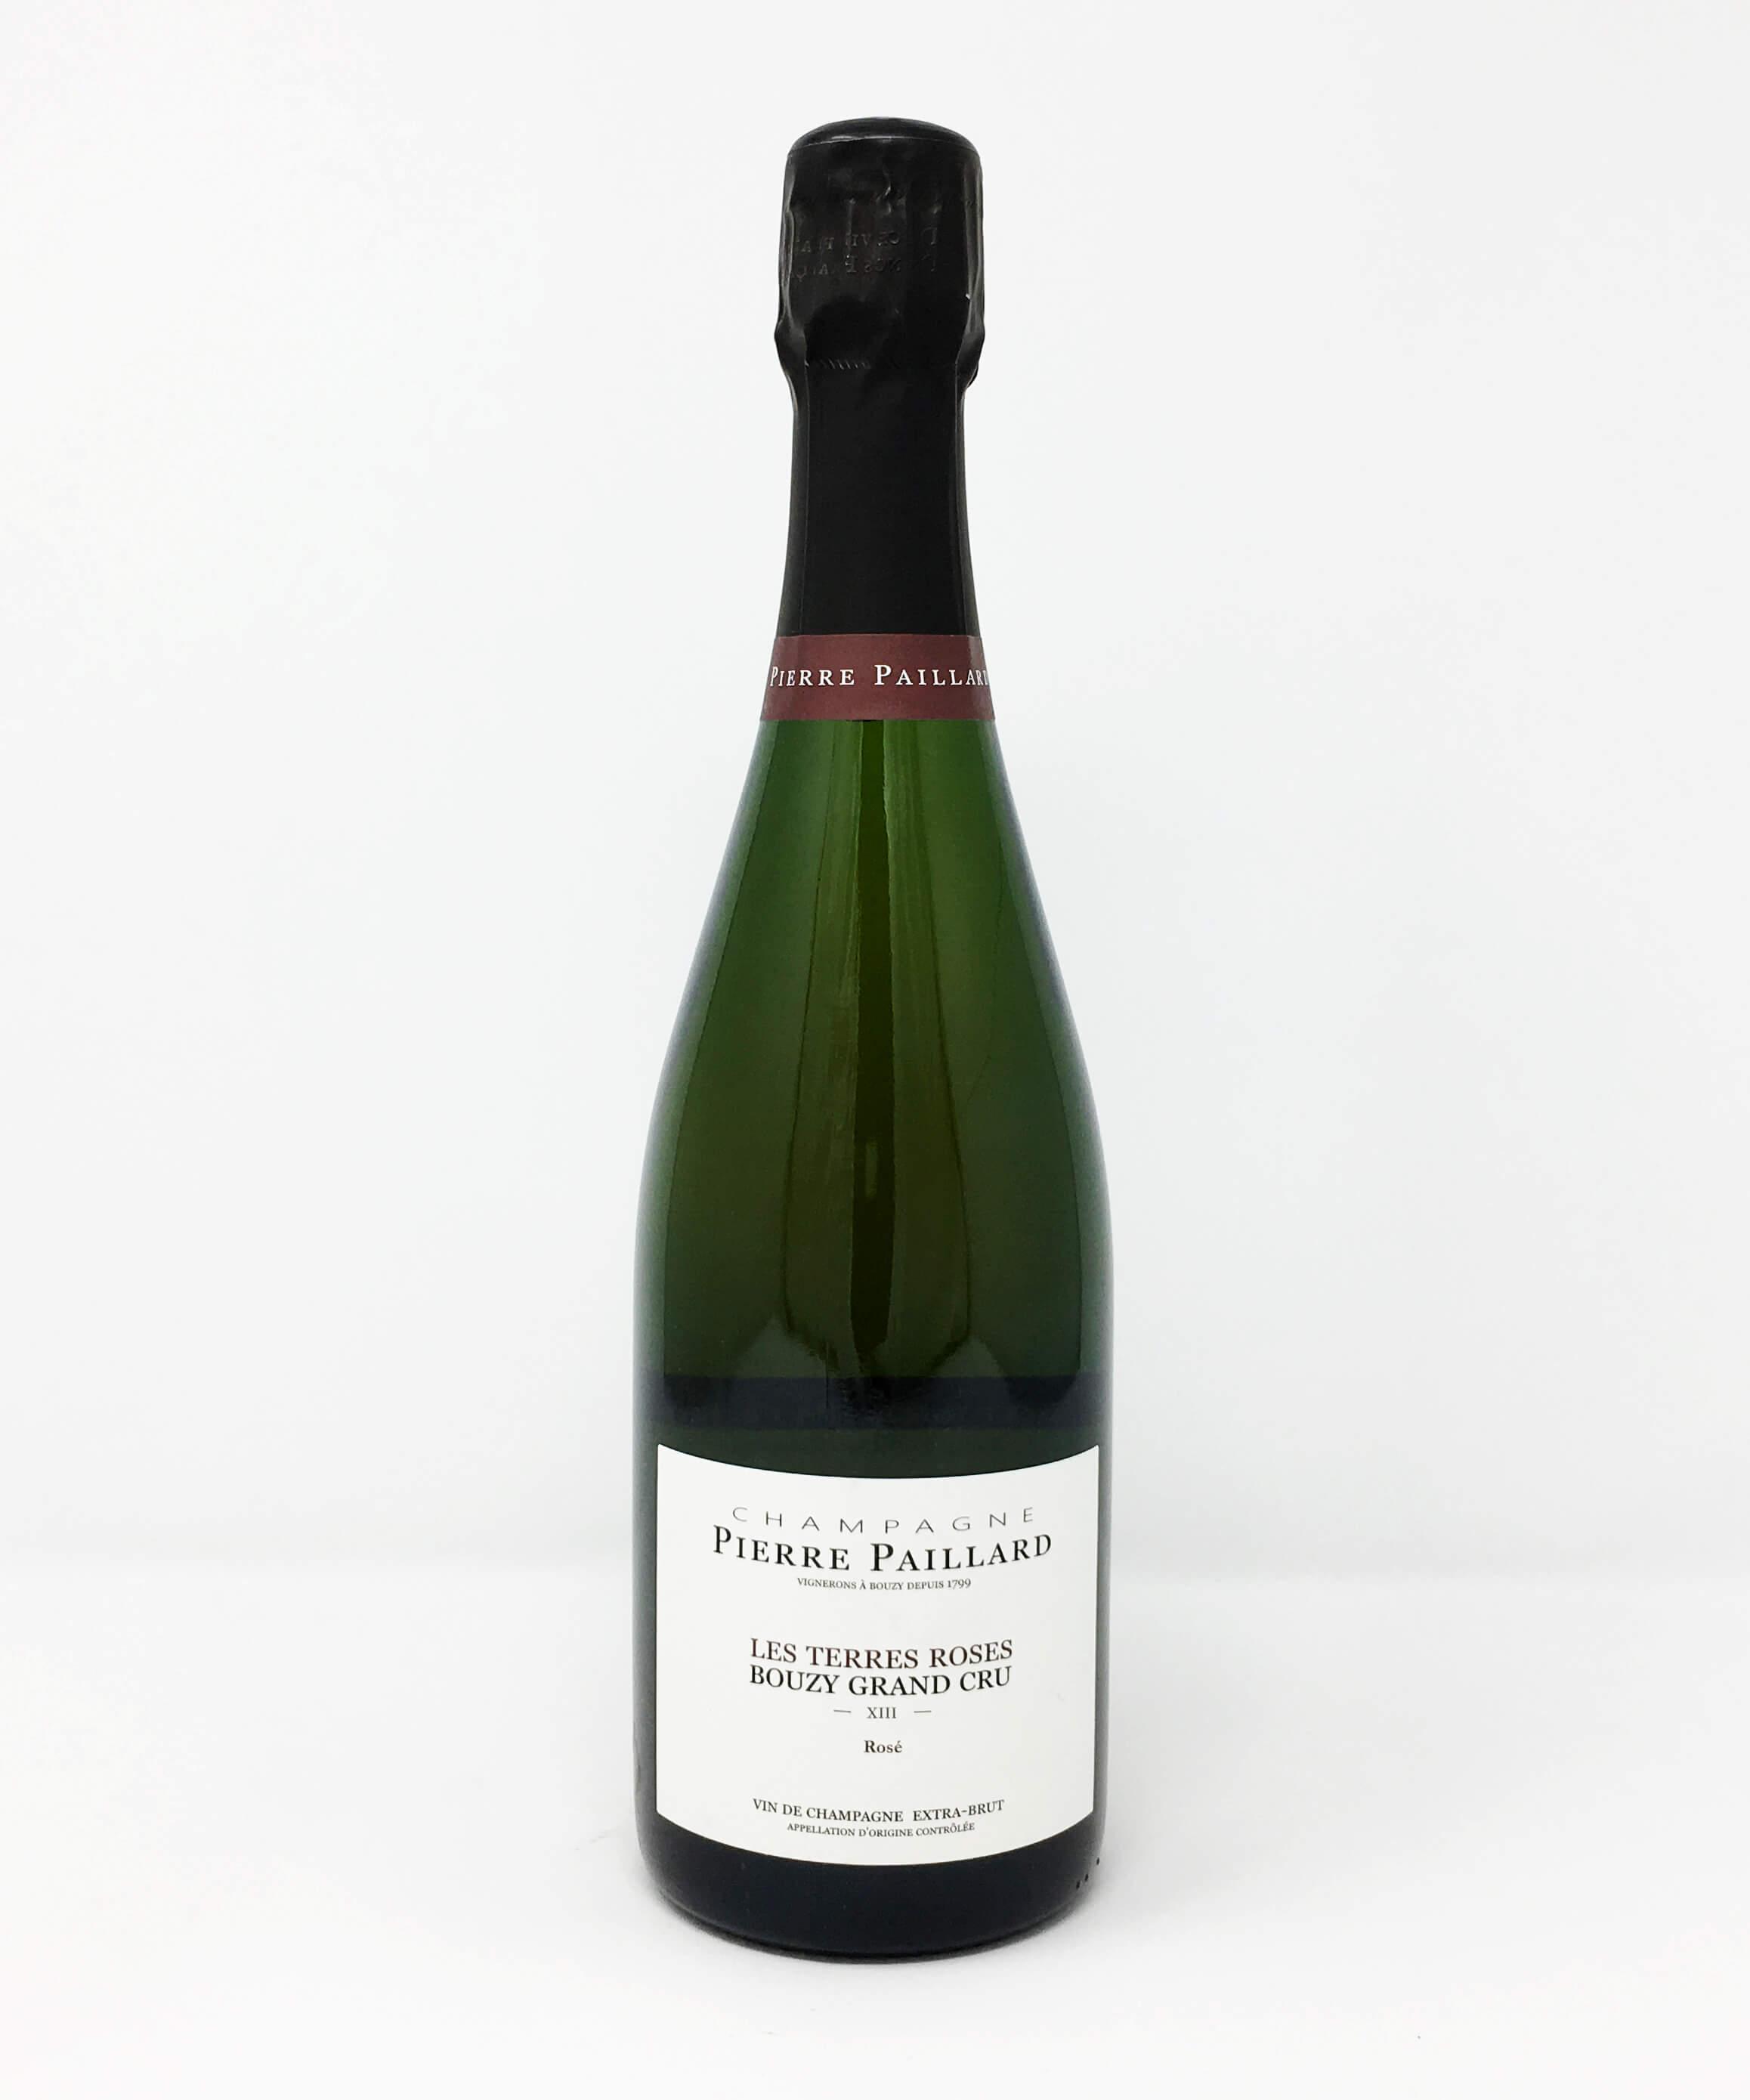 Pierre Paillard, Les Terres Roses, Bouzy Grand Cru